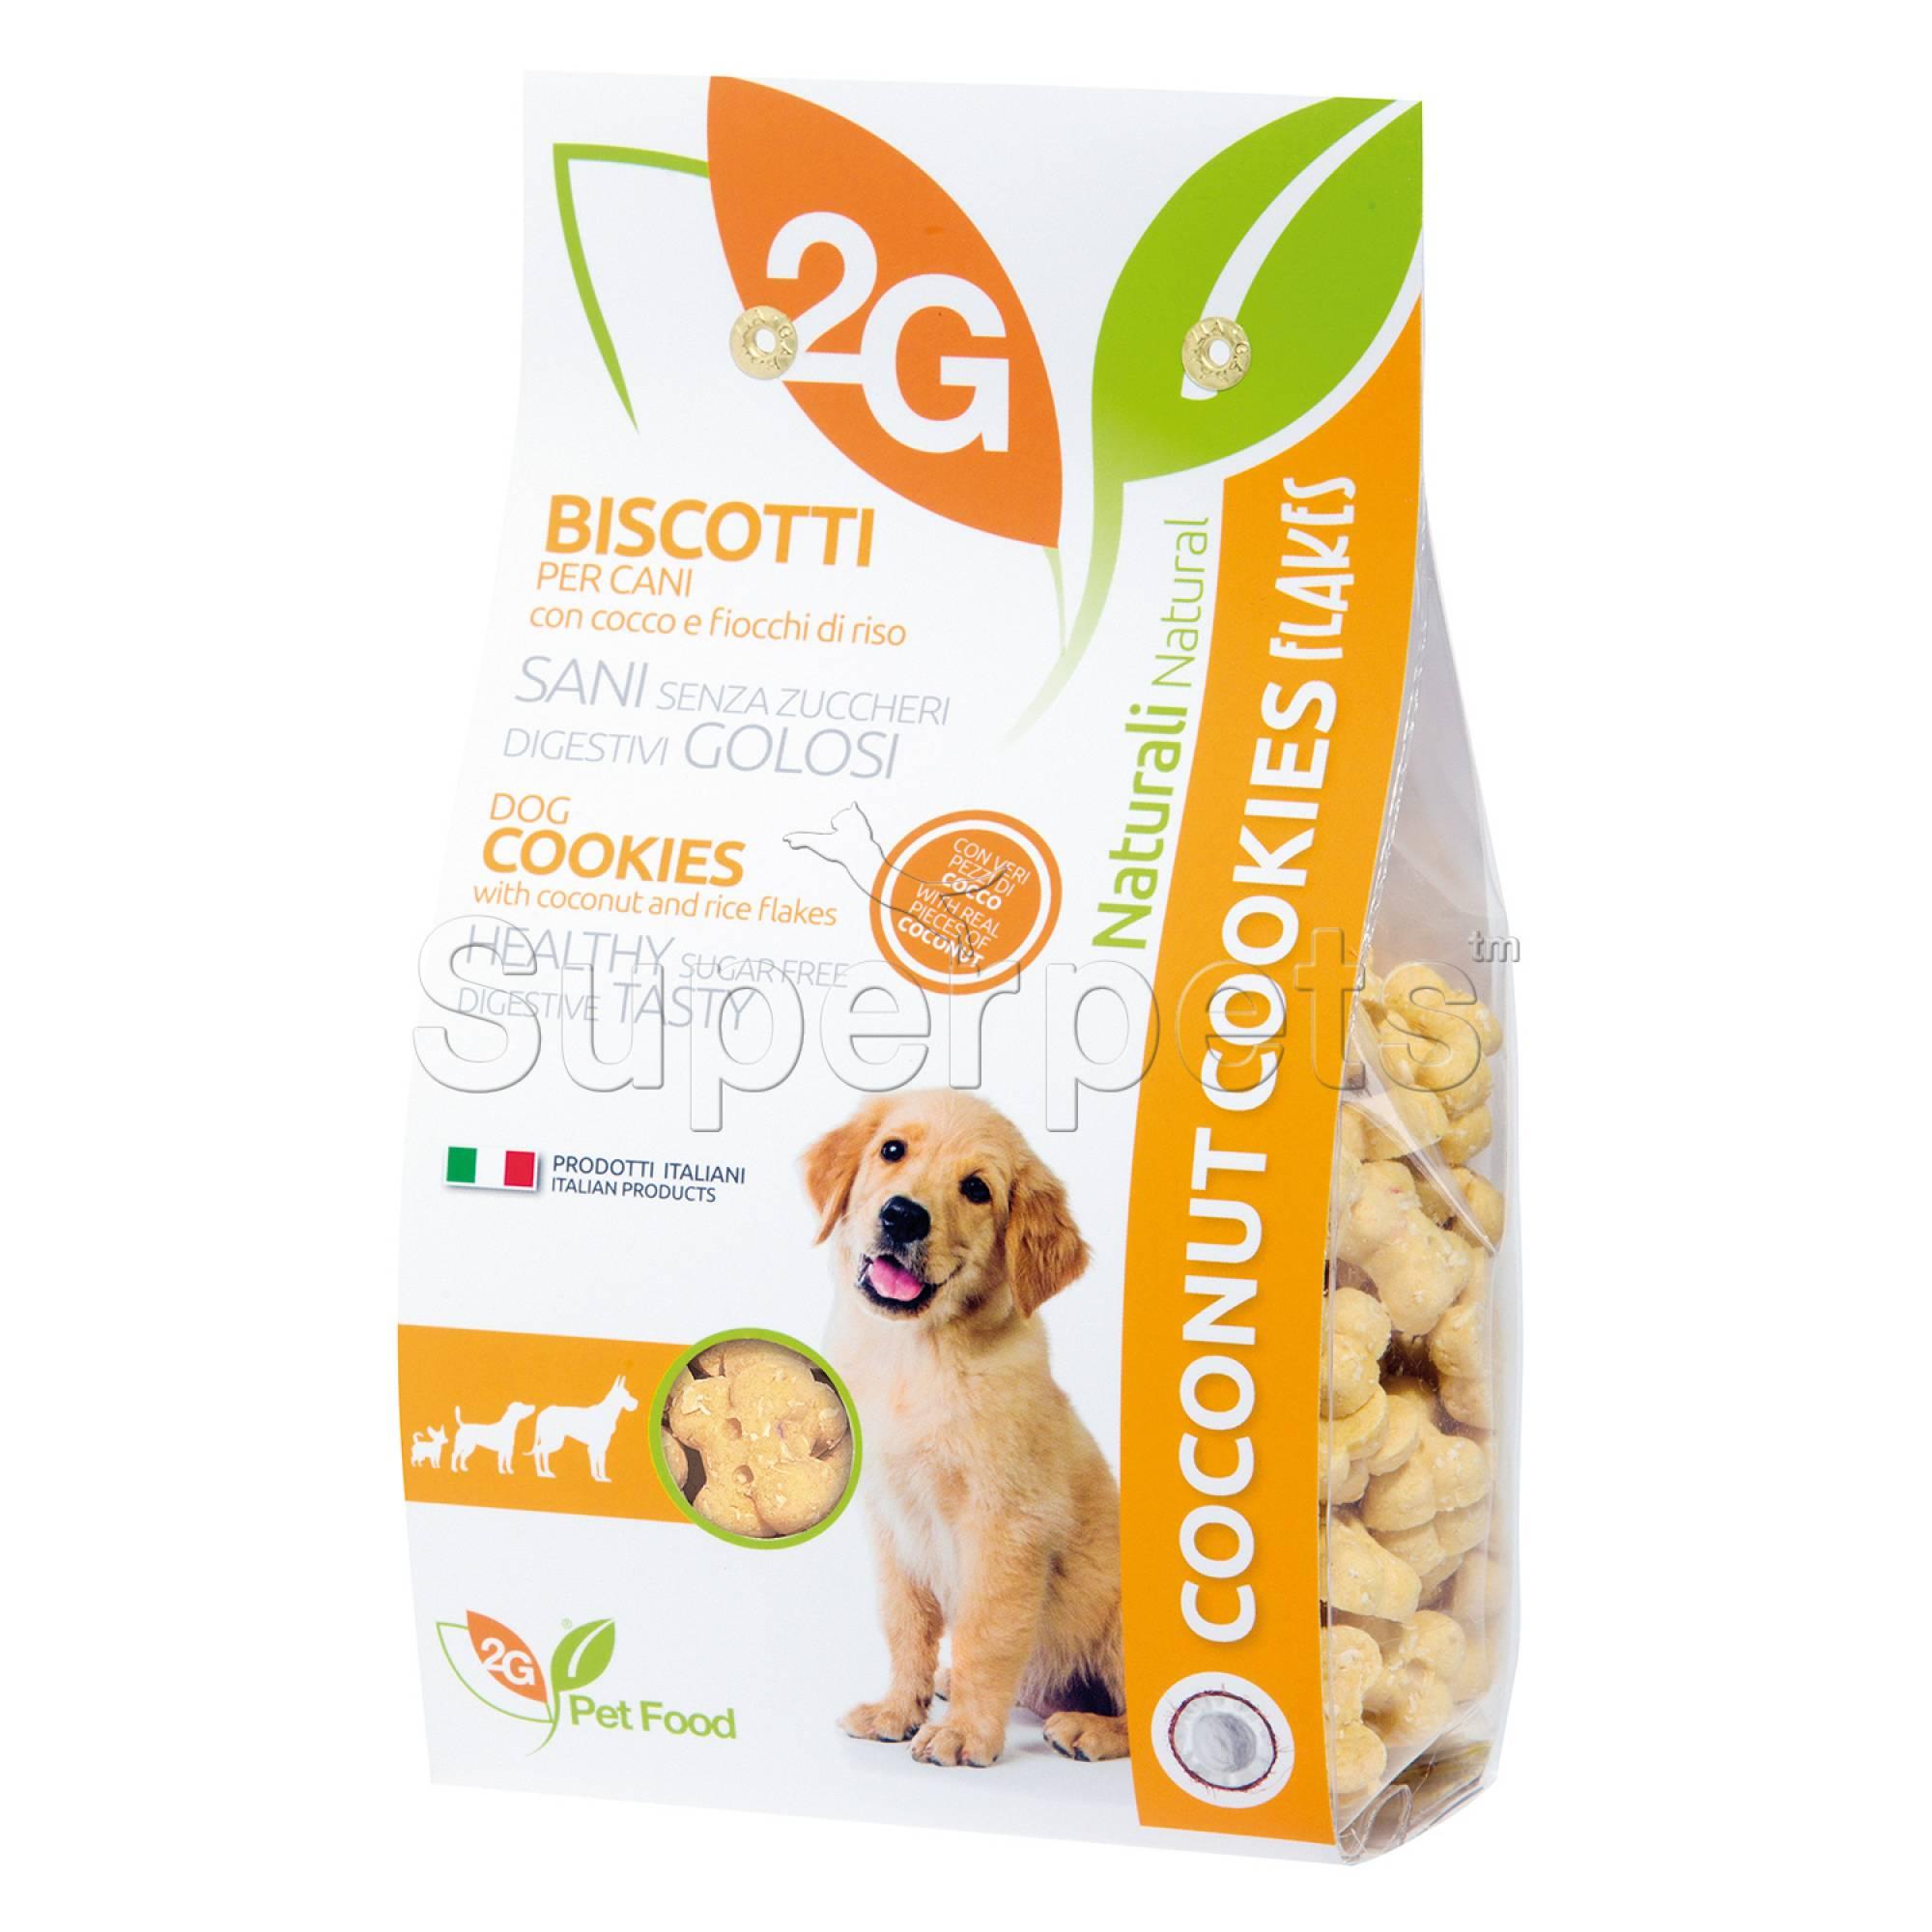 2G Pet Food - Coconut & Rice Dog Cookies 350g